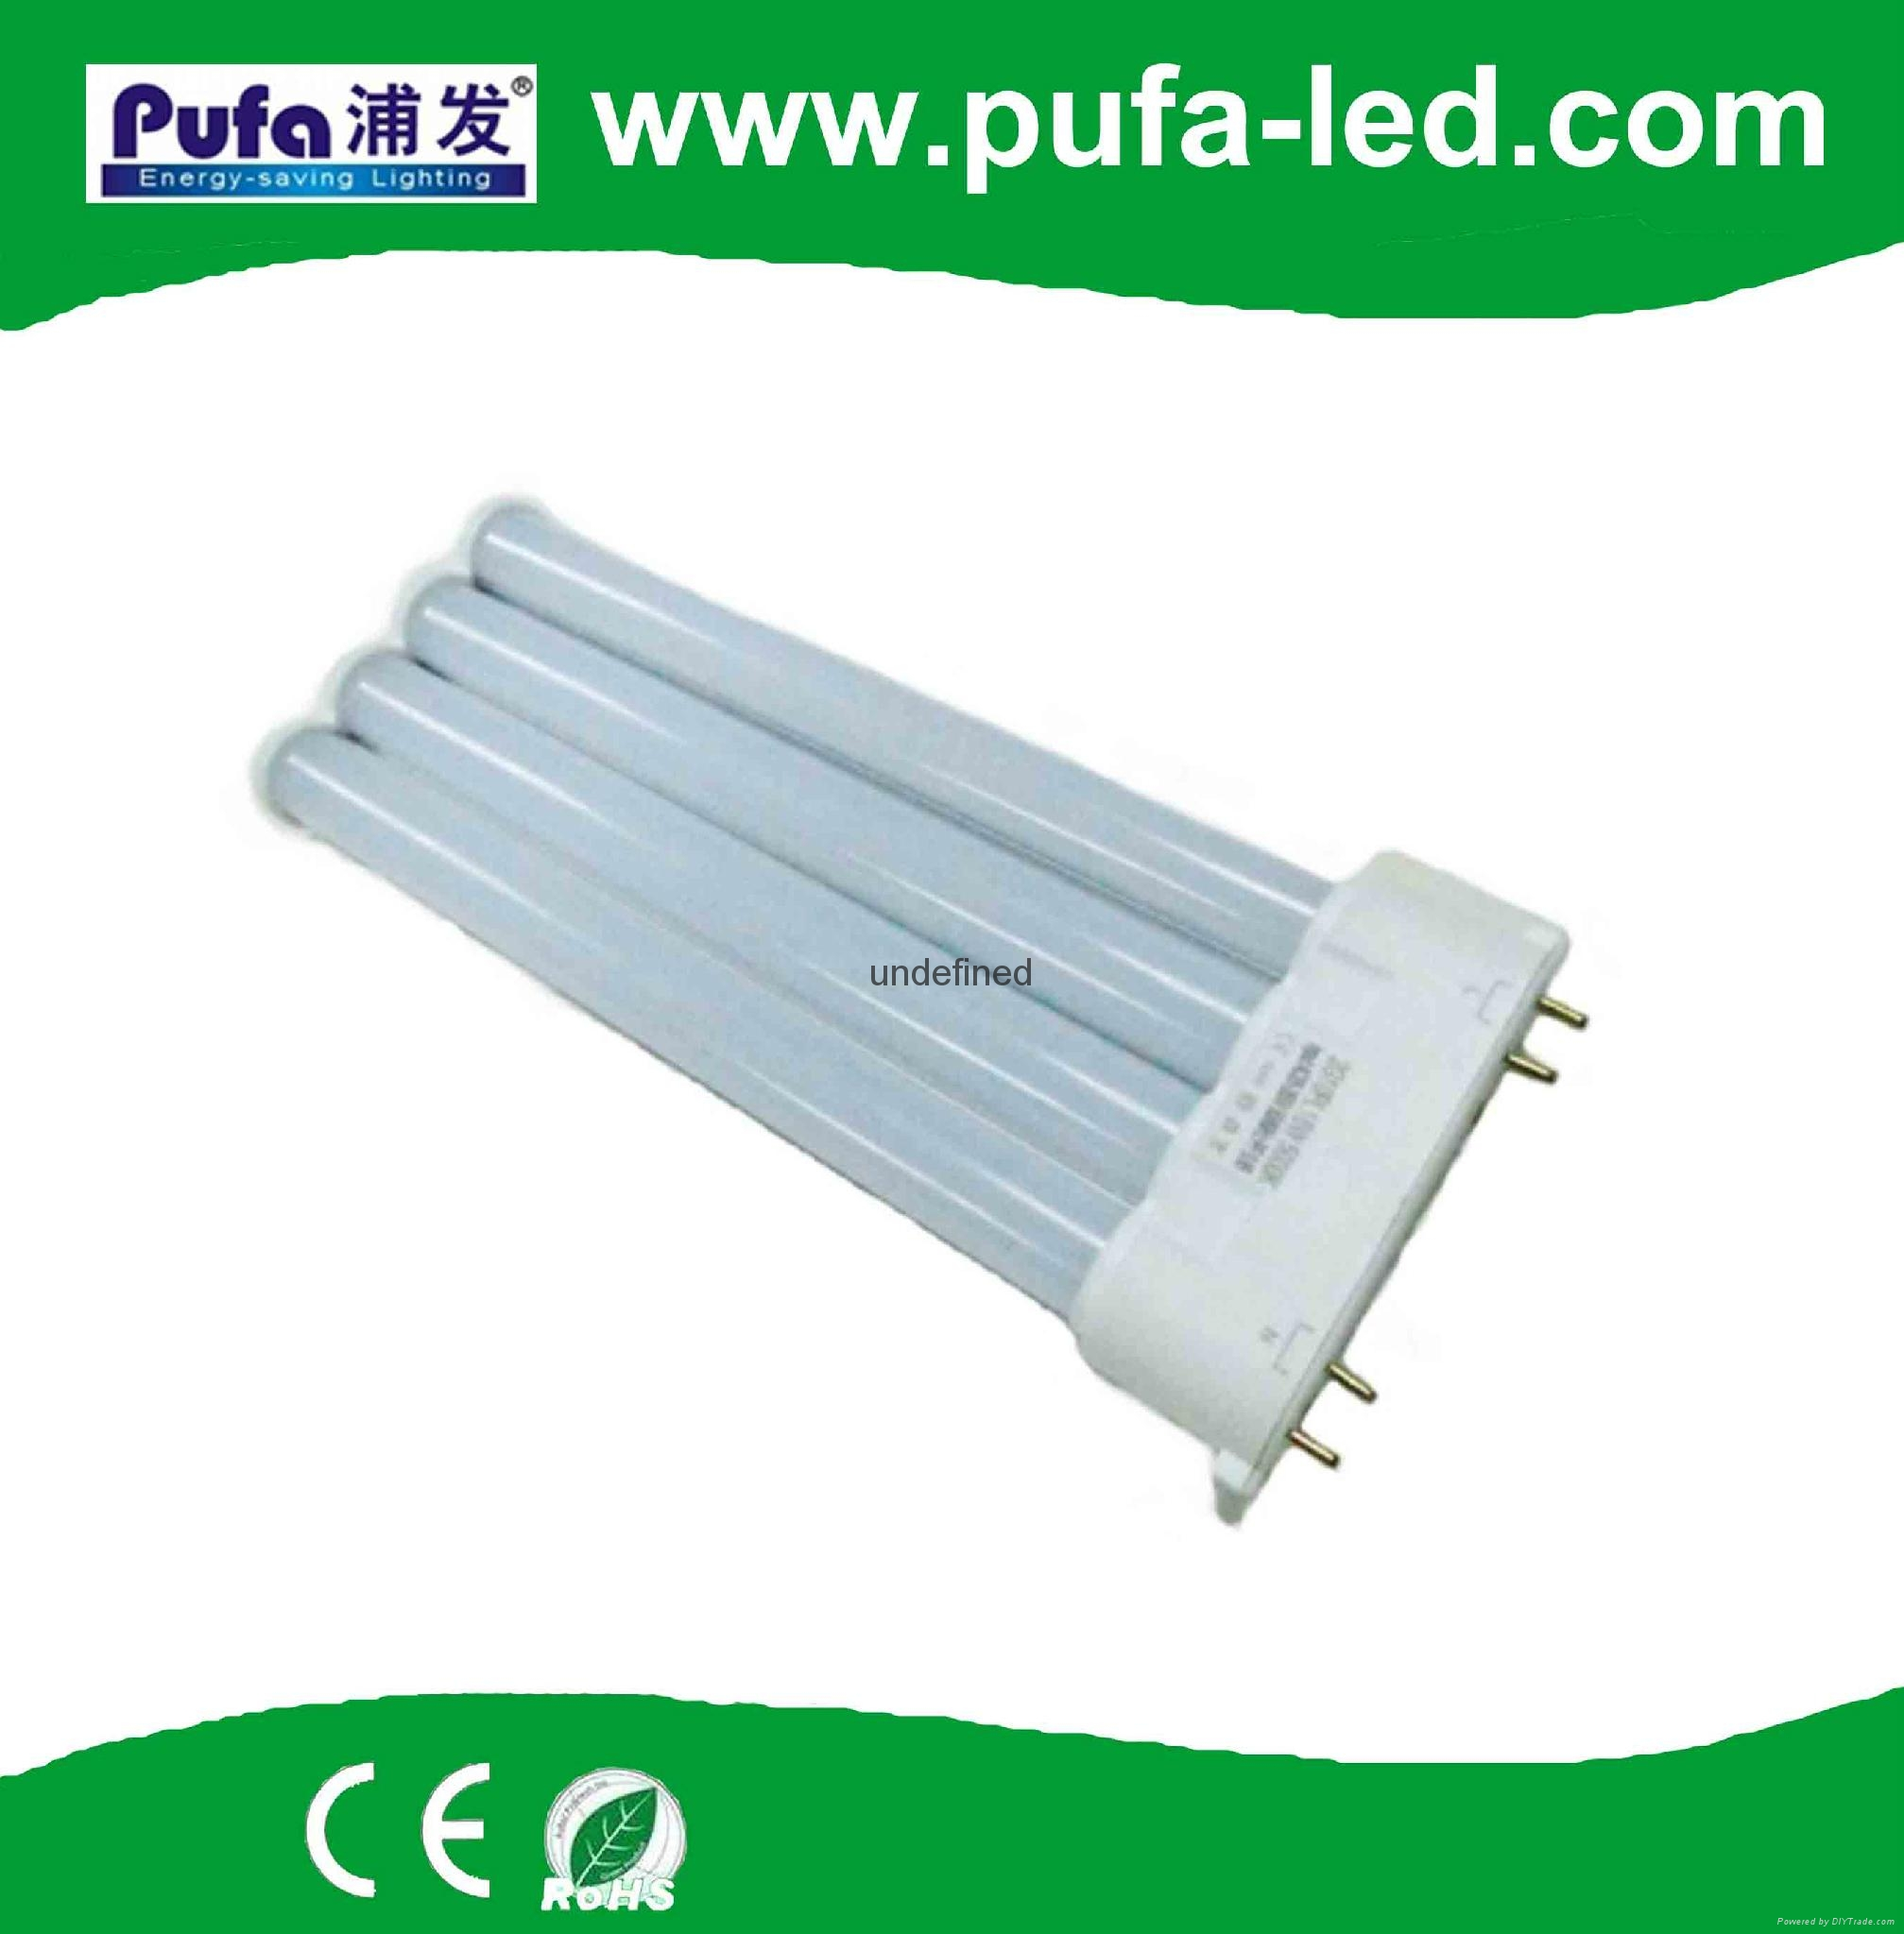 2G10 LED橫插燈管 13W 1